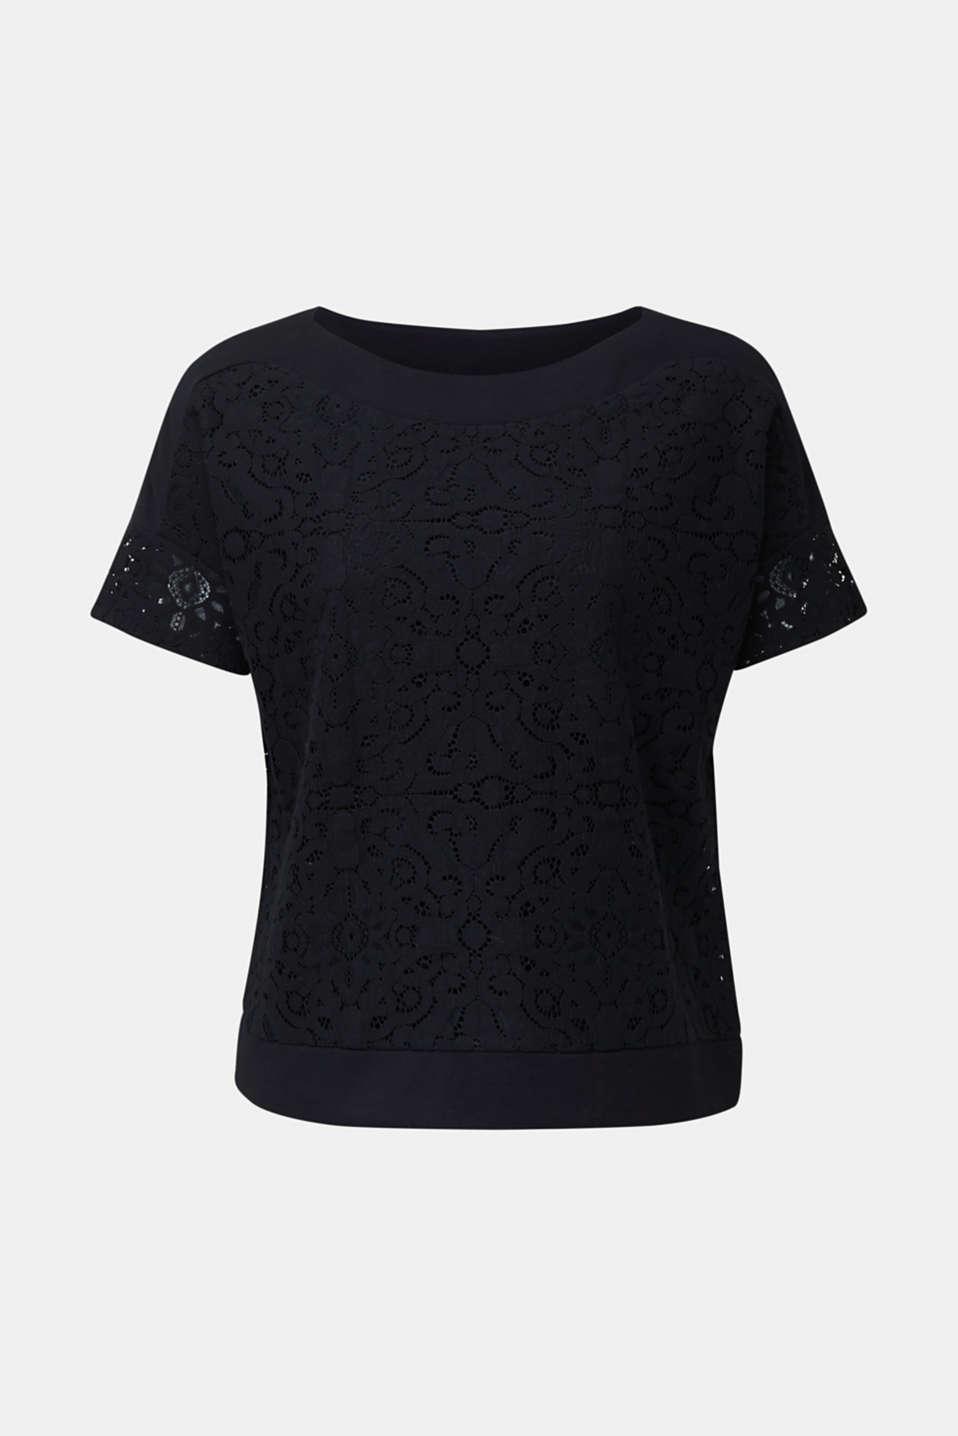 Floral lace blouse top, BLACK, detail image number 5